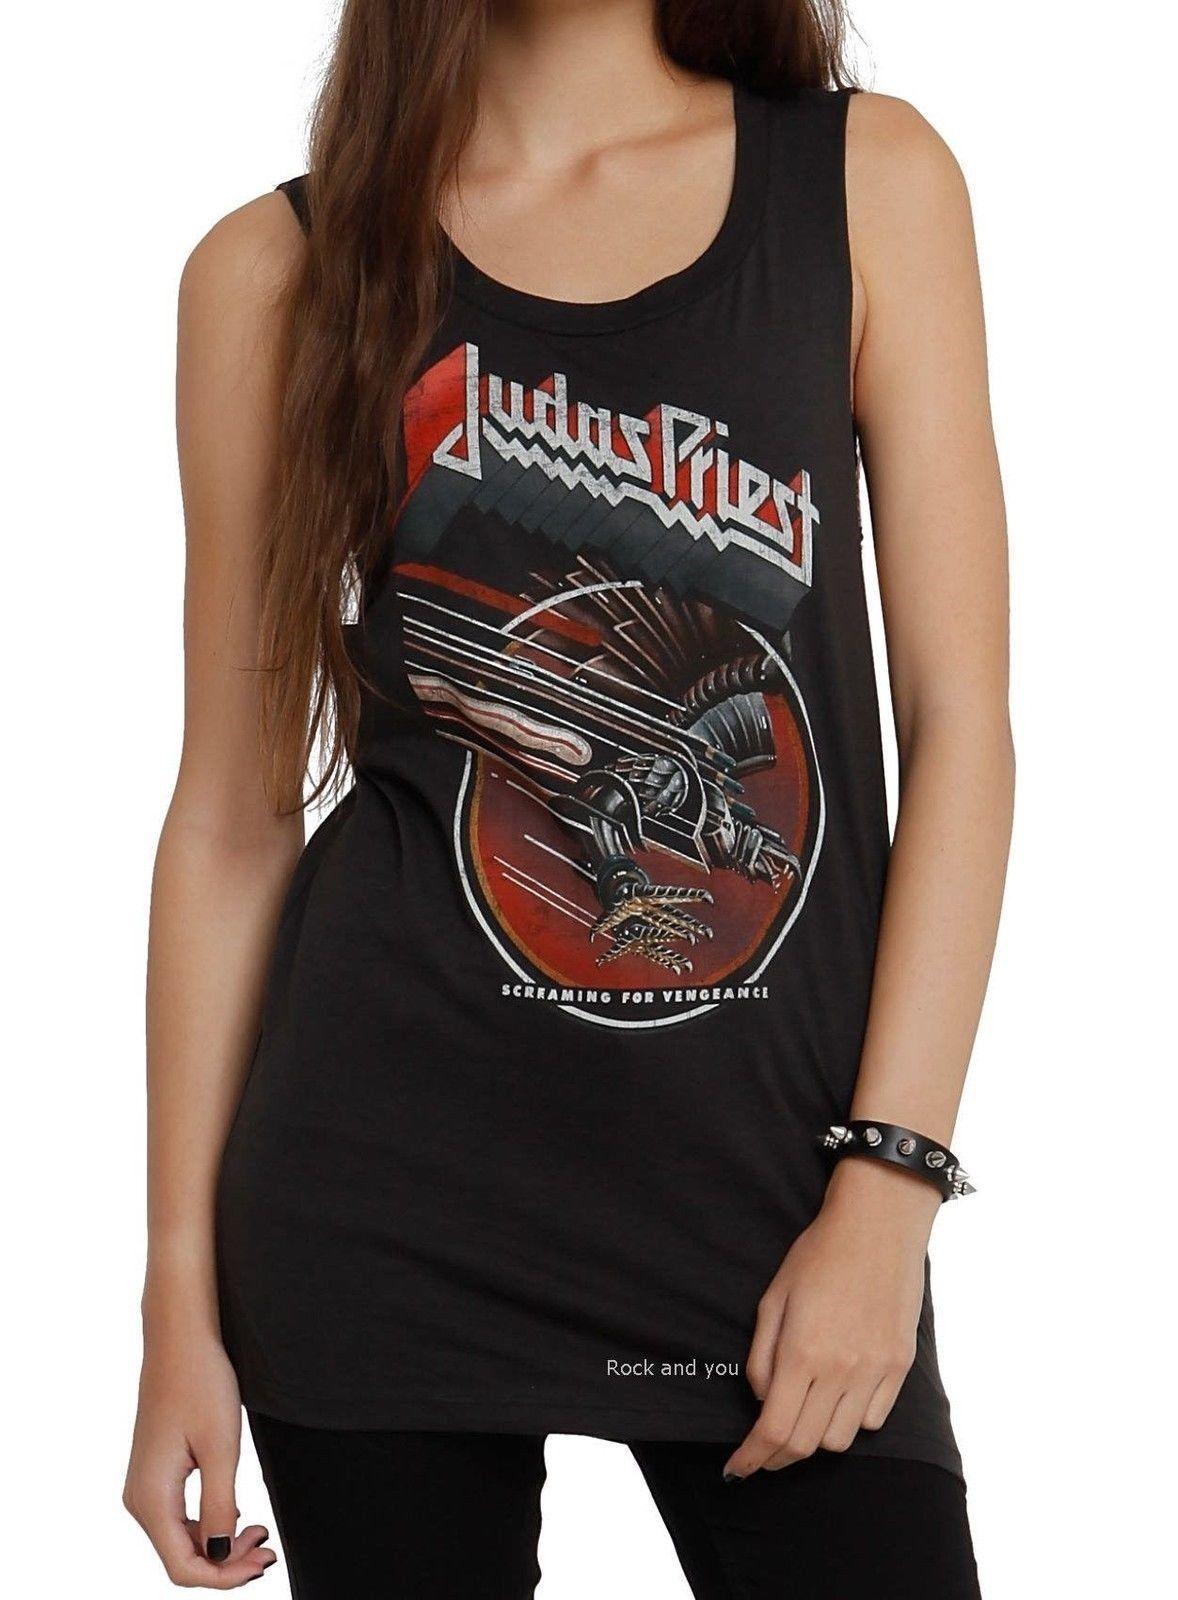 97c2a5ed Judas Priest T-Shirt Screaming for Vengeance metal rock Girls Tank XL Last  NWT